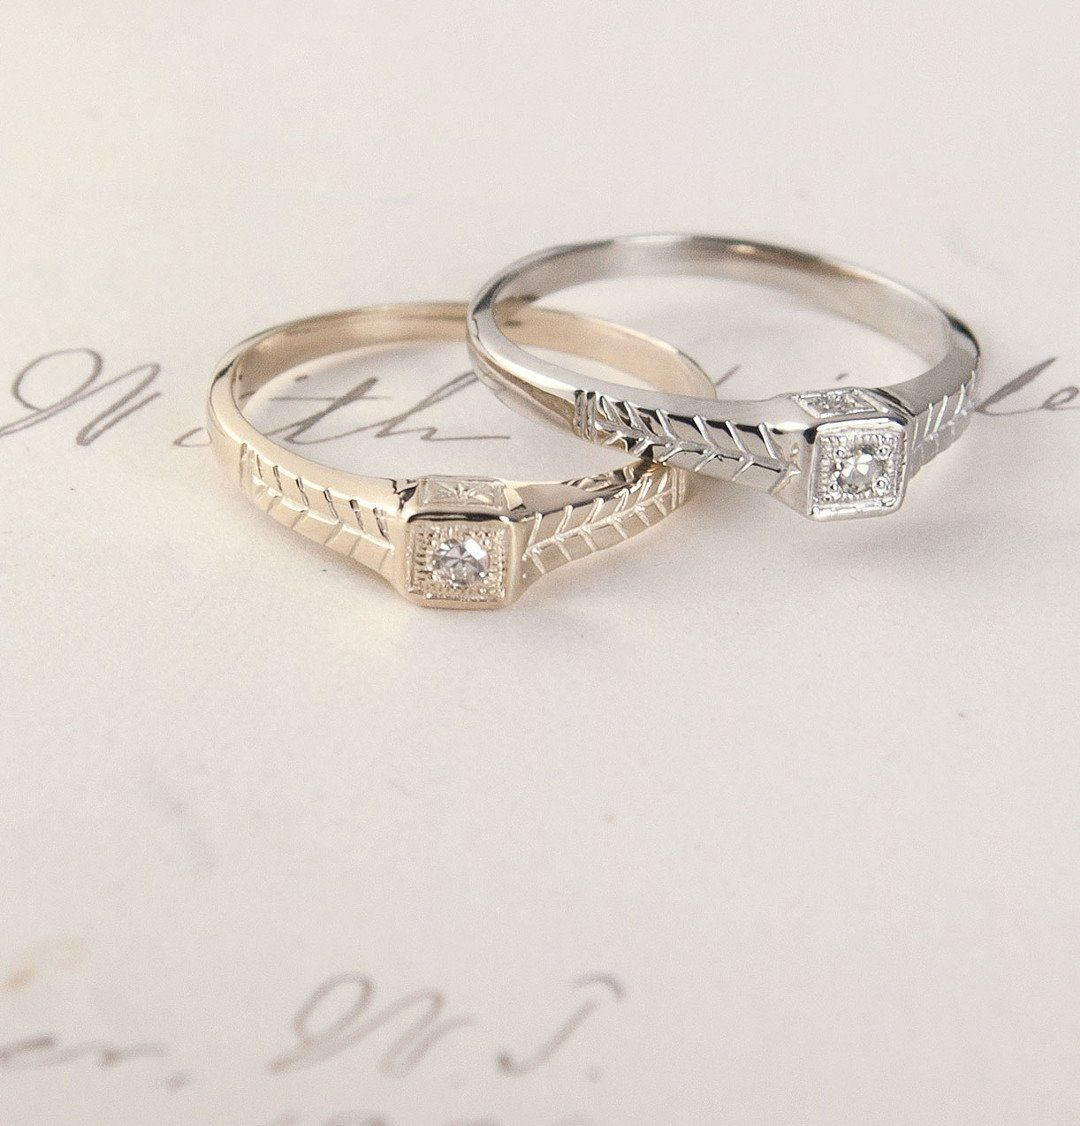 Tiniest Diamond Ring (14k White Gold)